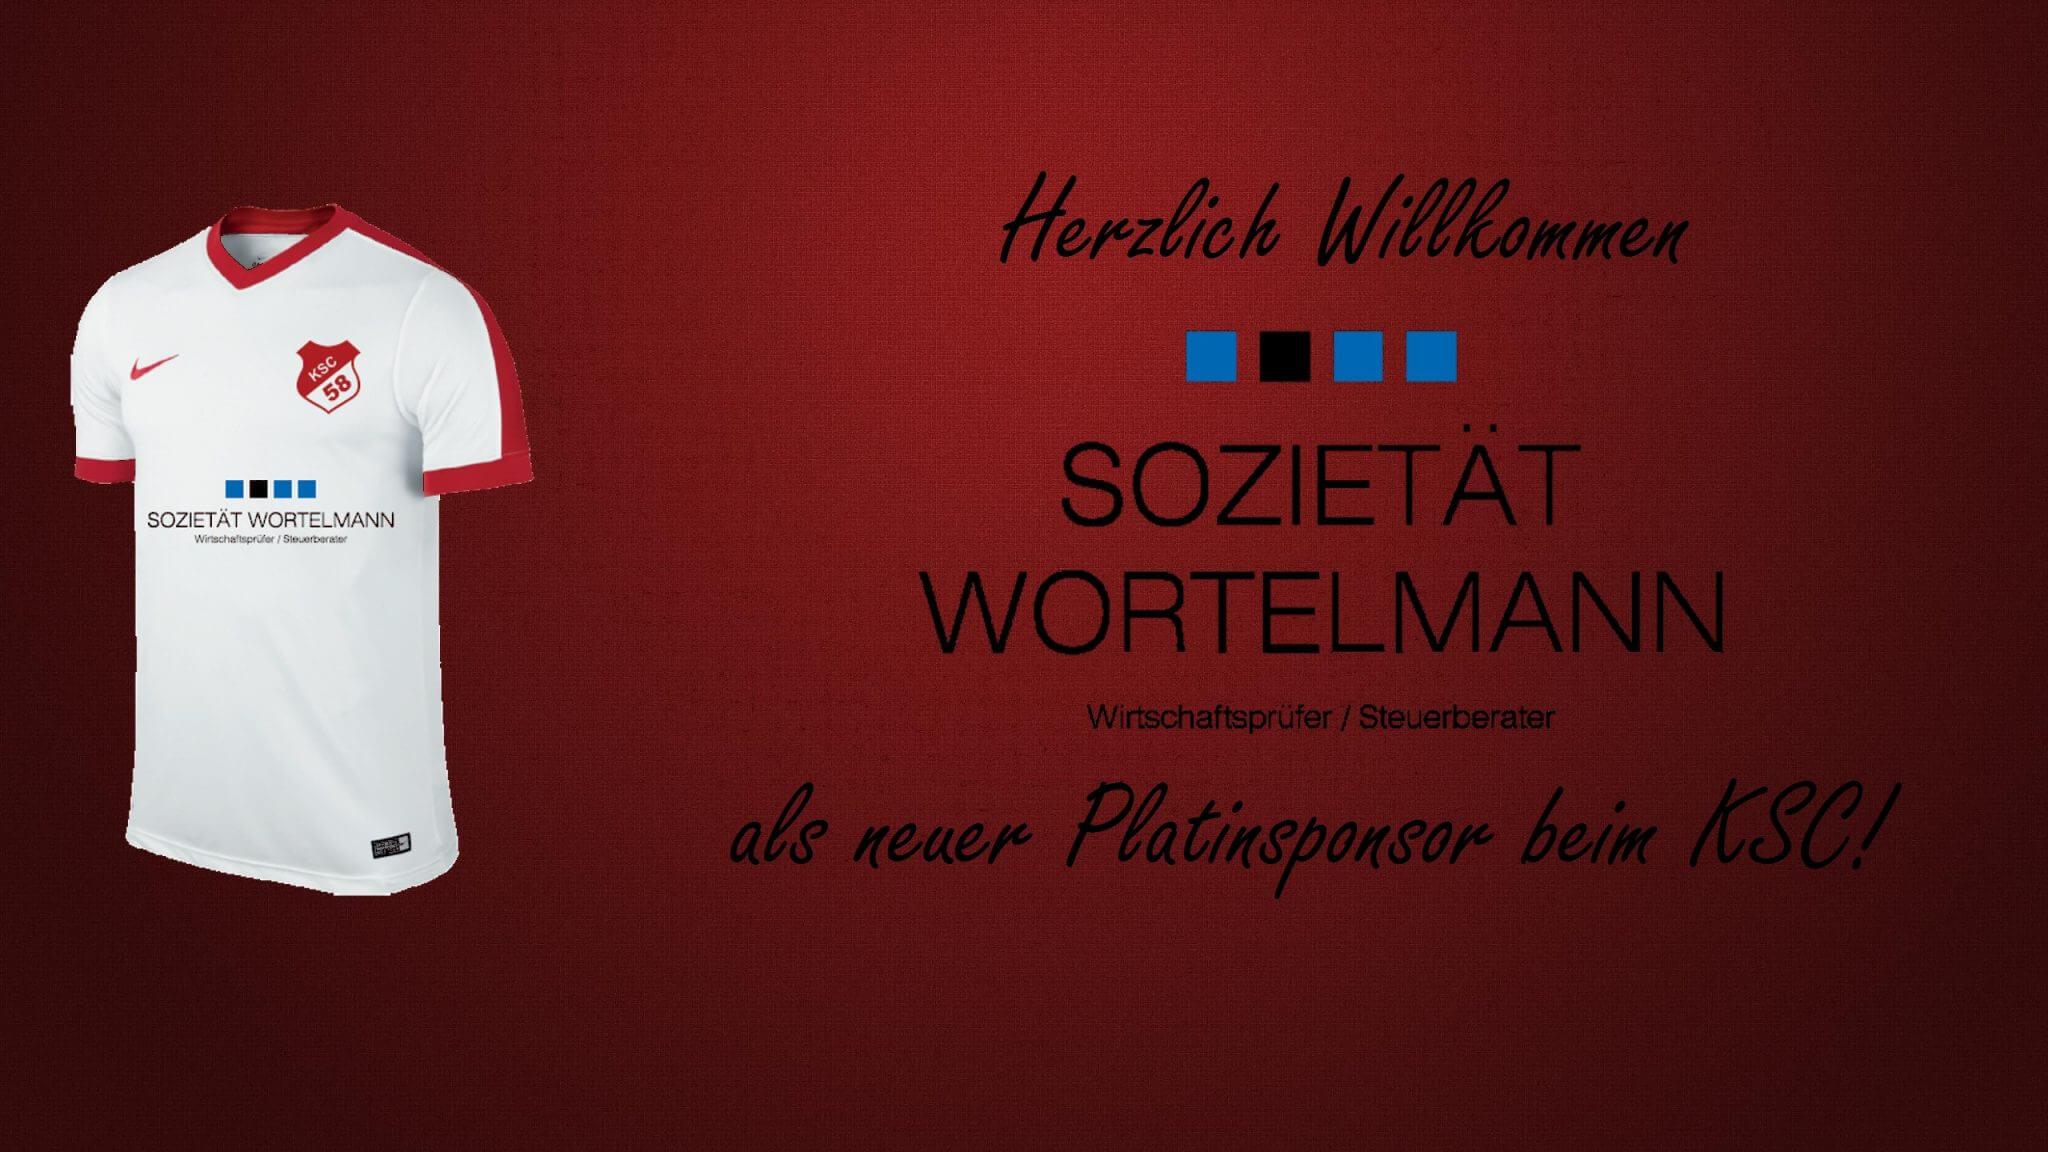 wortelmann-platinsponsor